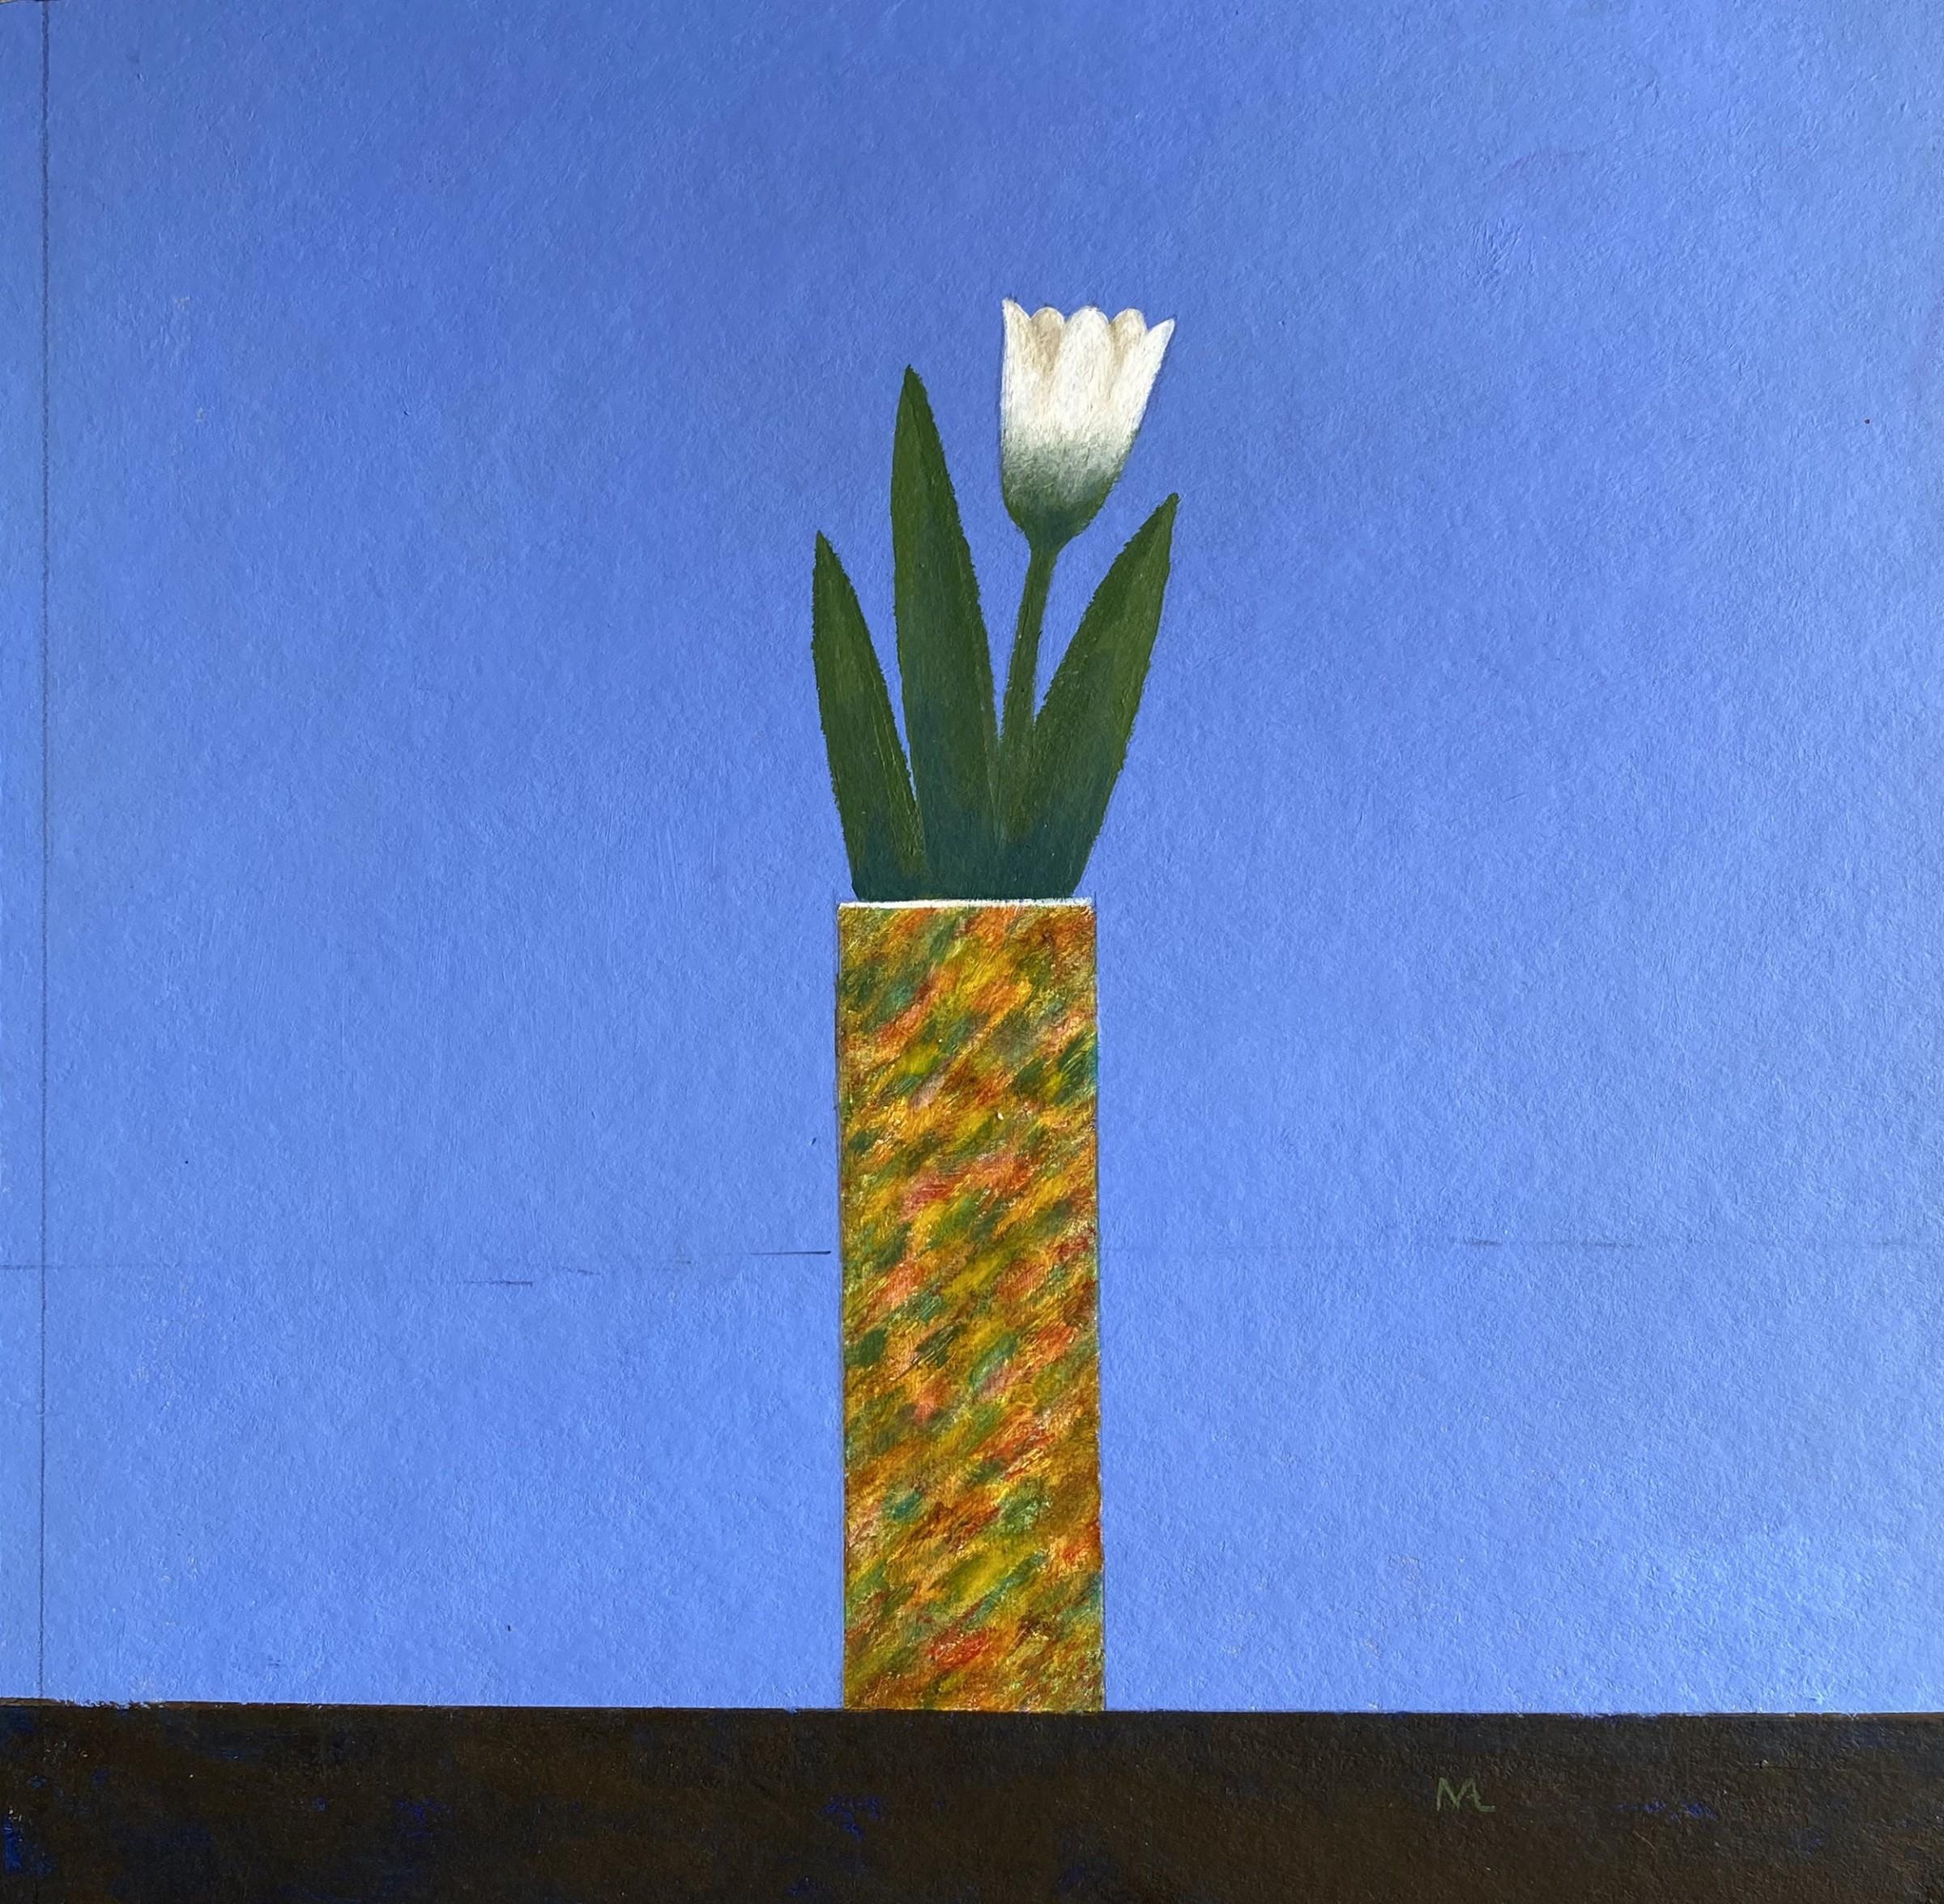 "<span class=""link fancybox-details-link""><a href=""/artists/78-martin-leman/works/12670-martin-leman-white-flower/"">View Detail Page</a></span><div class=""artist""><span class=""artist""><strong>Martin Leman</strong></span></div><div class=""title""><em>White Flower</em></div><div class=""medium"">acrylic</div><div class=""dimensions"">Artwork: 25 x 25cm</div><div class=""price"">£750.00</div>"